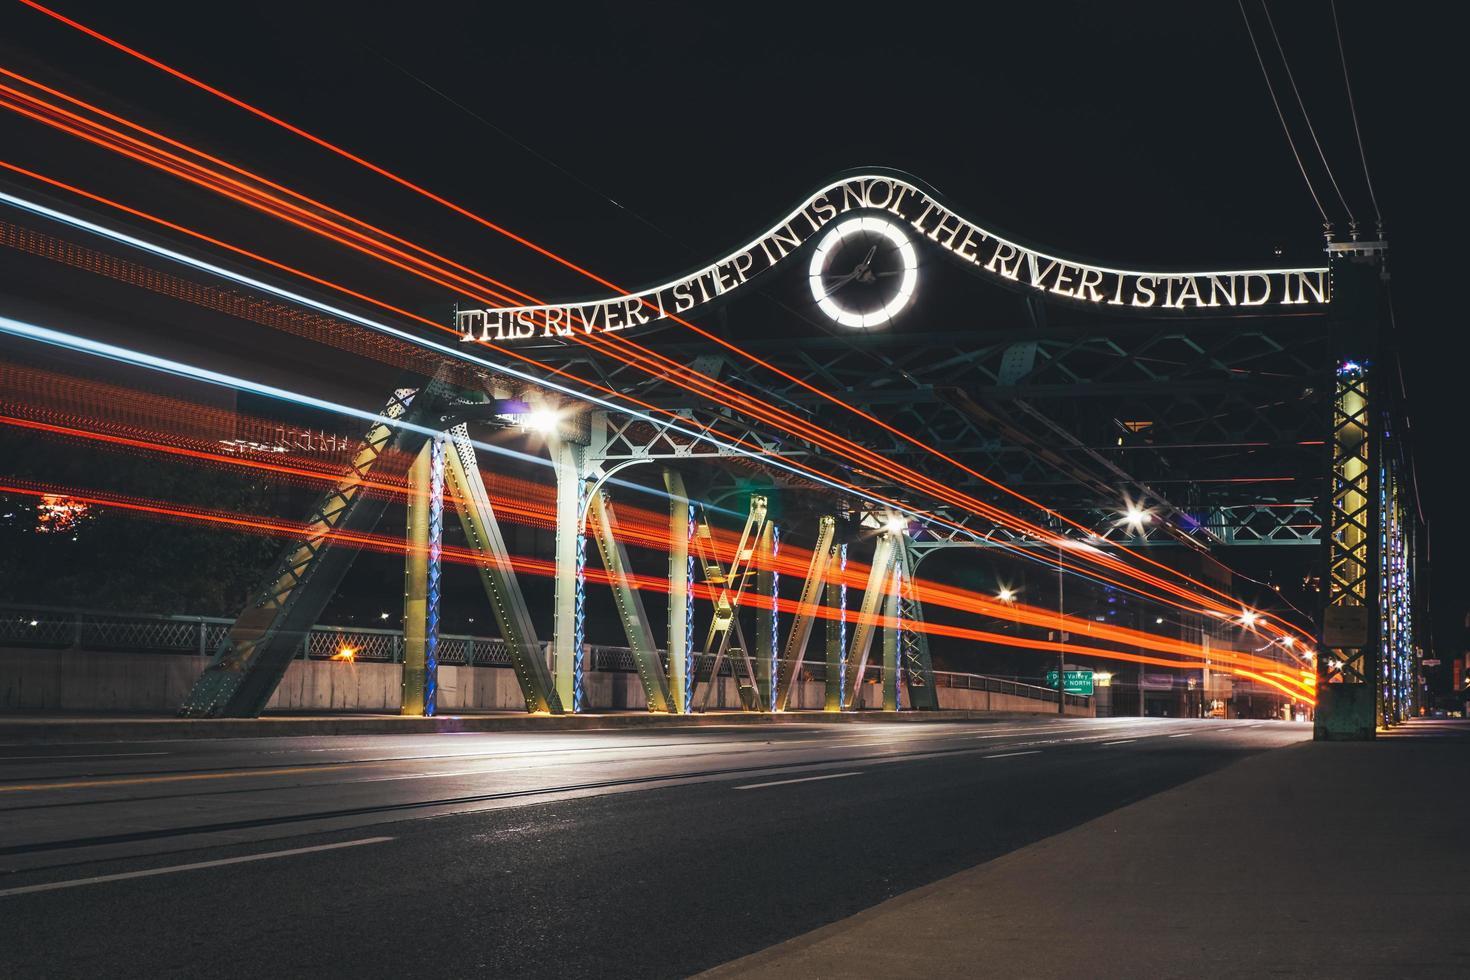 The Queen Street Viaduct in Toronto photo